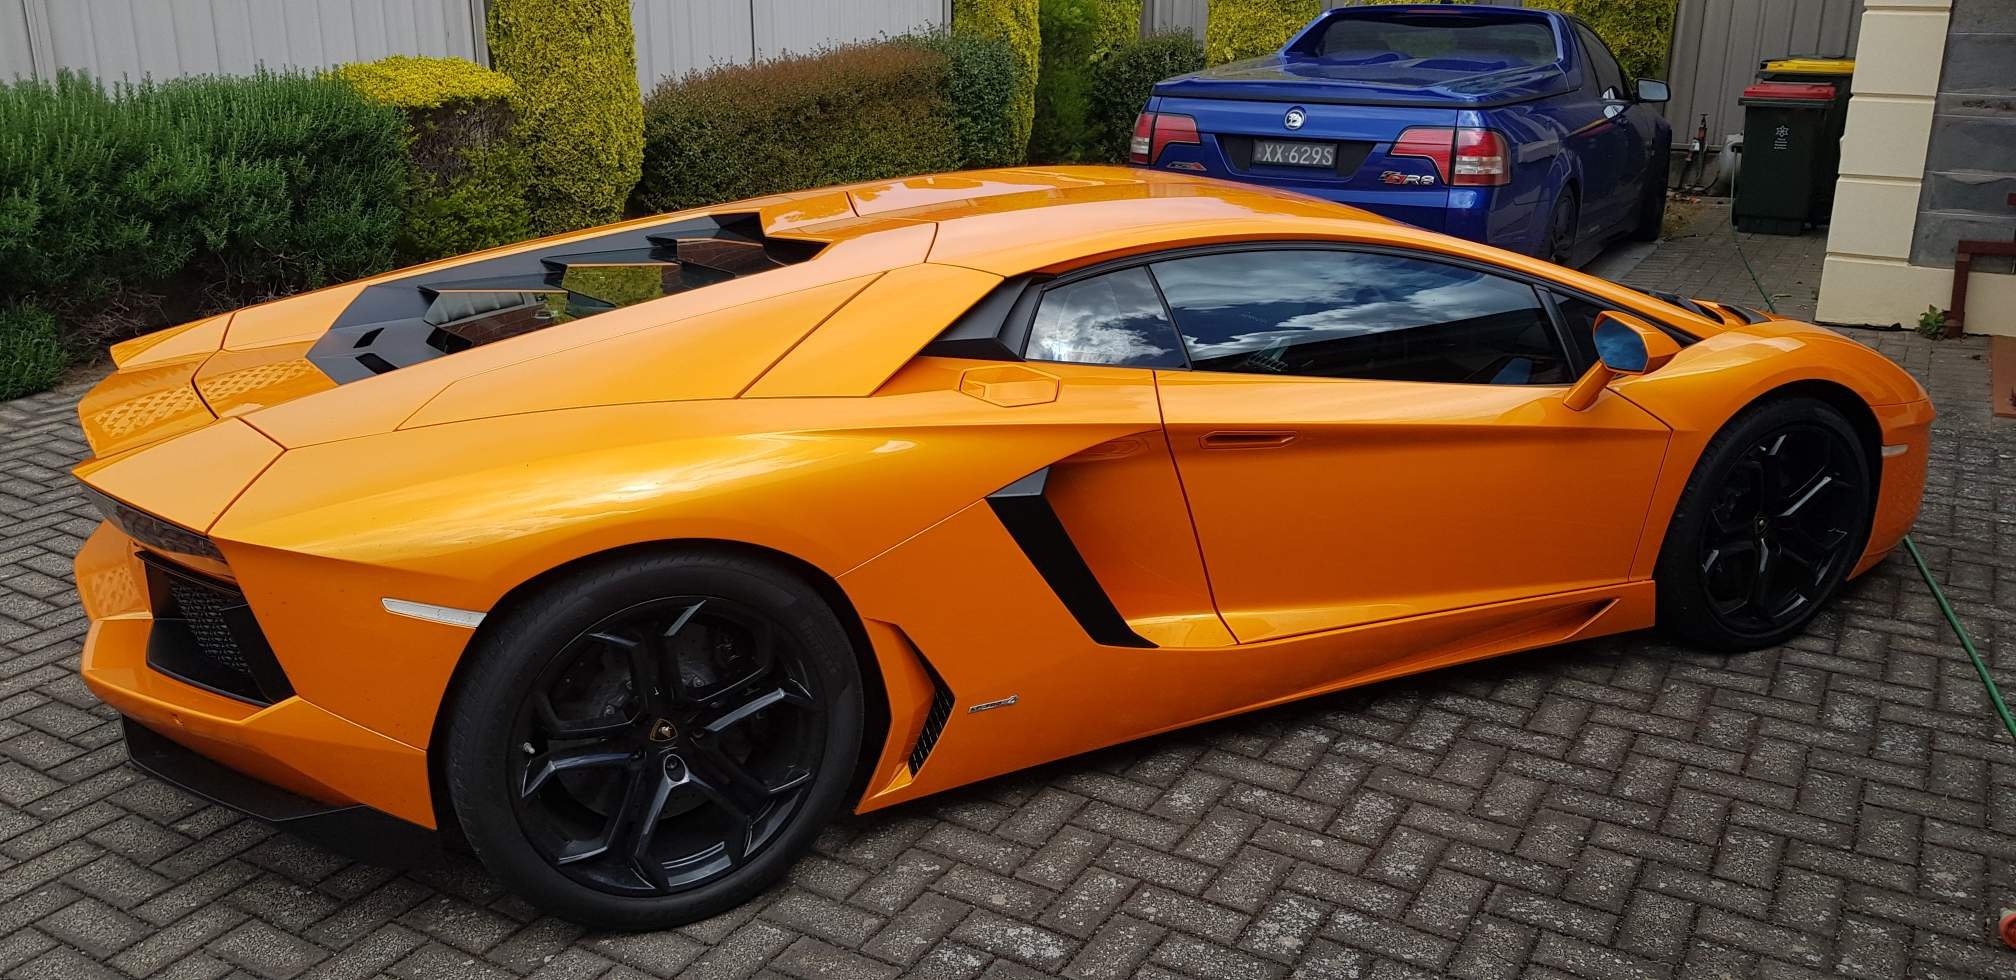 This is one of Detailing Adelaide favourite regular detailing jobs a bright orange fabulous Lamborghini